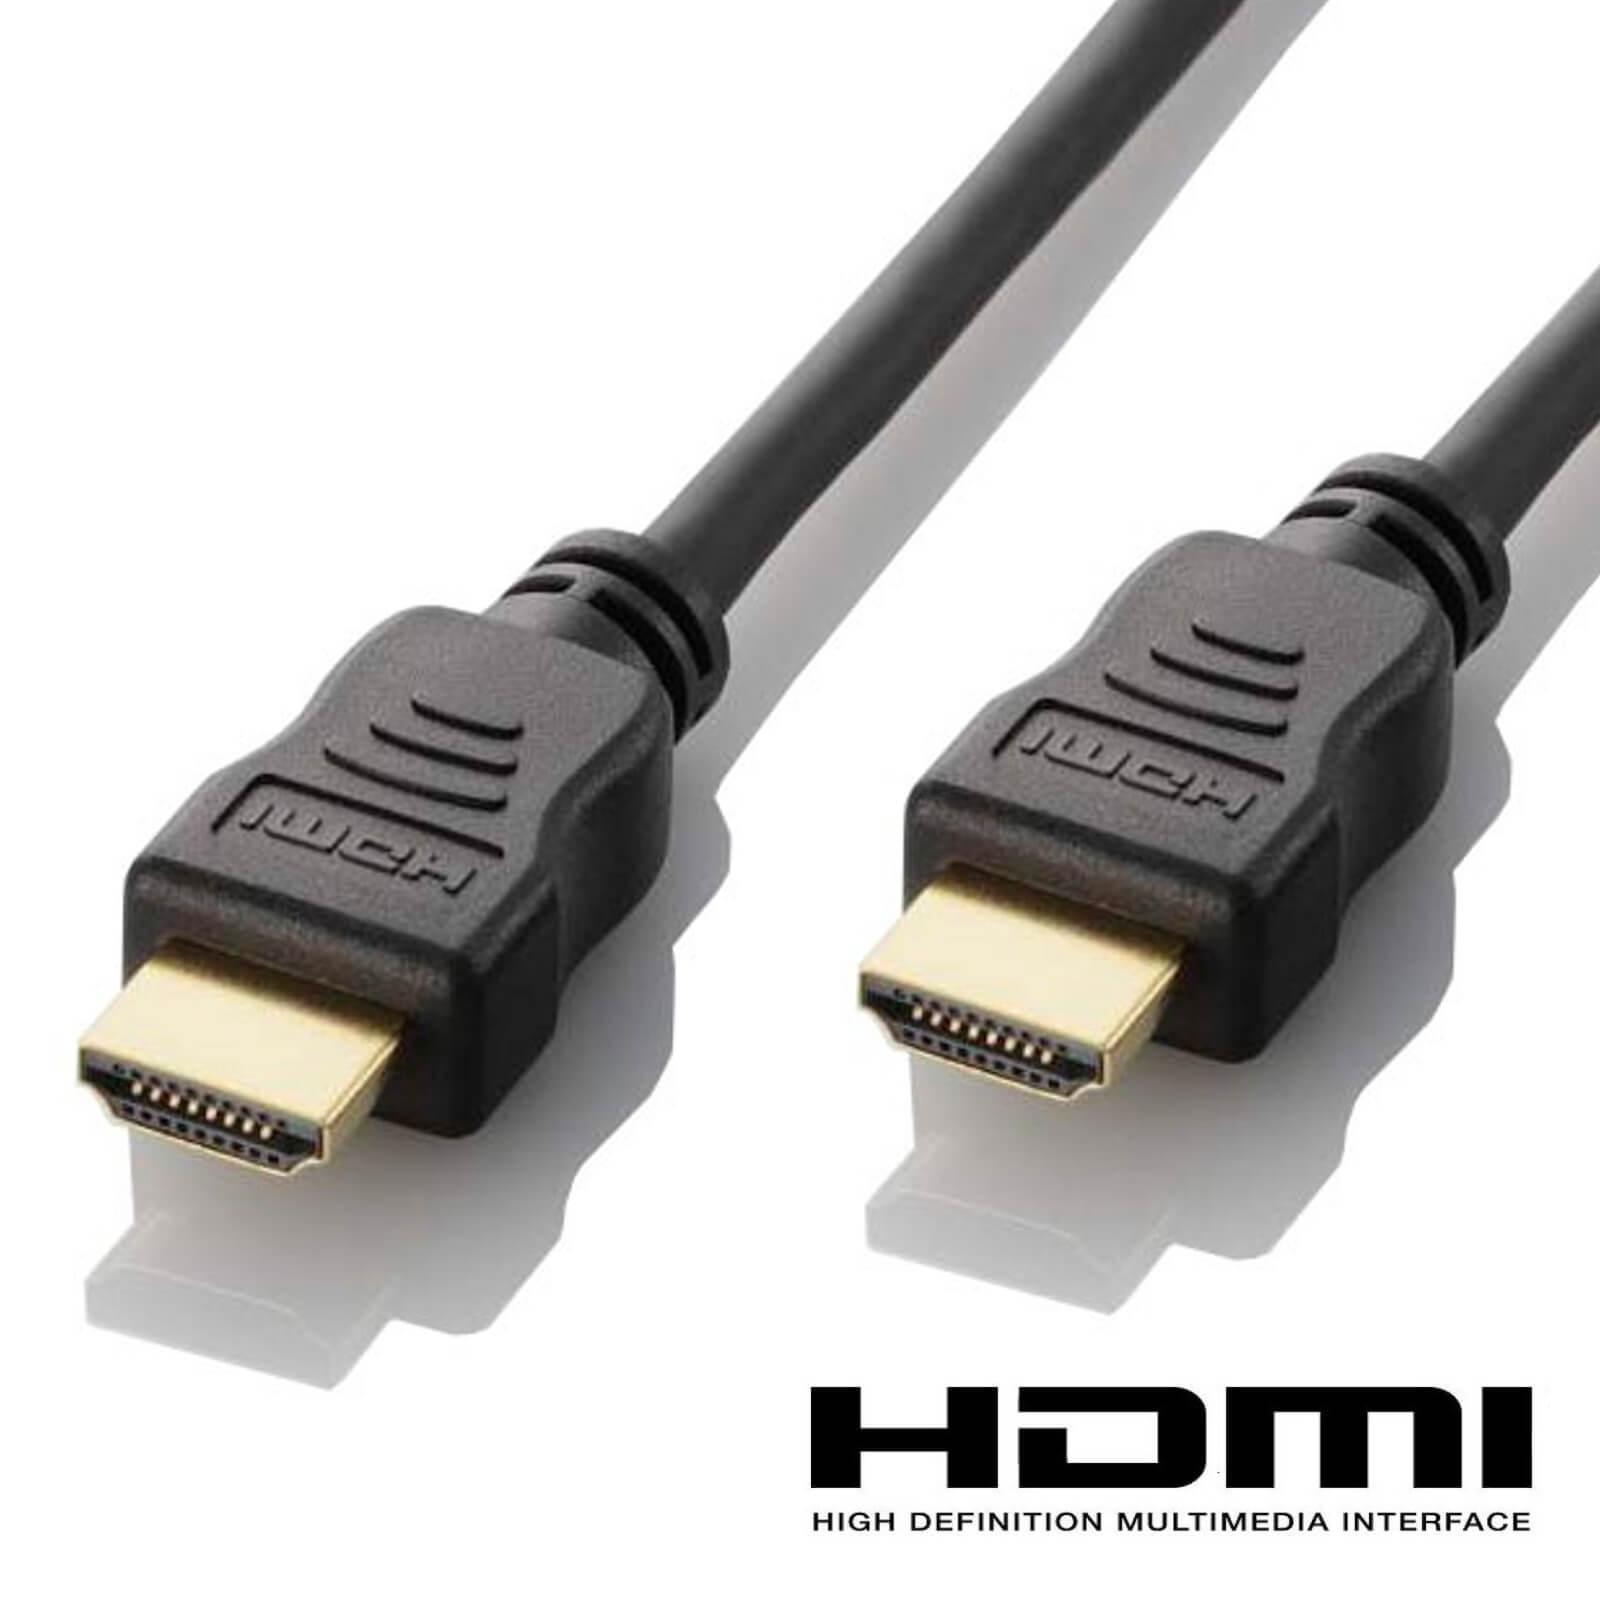 Lenovo Y700-17, Y700-15 HDMI to HDMI 4K Ultra HD TV 2m Gold Lead ...